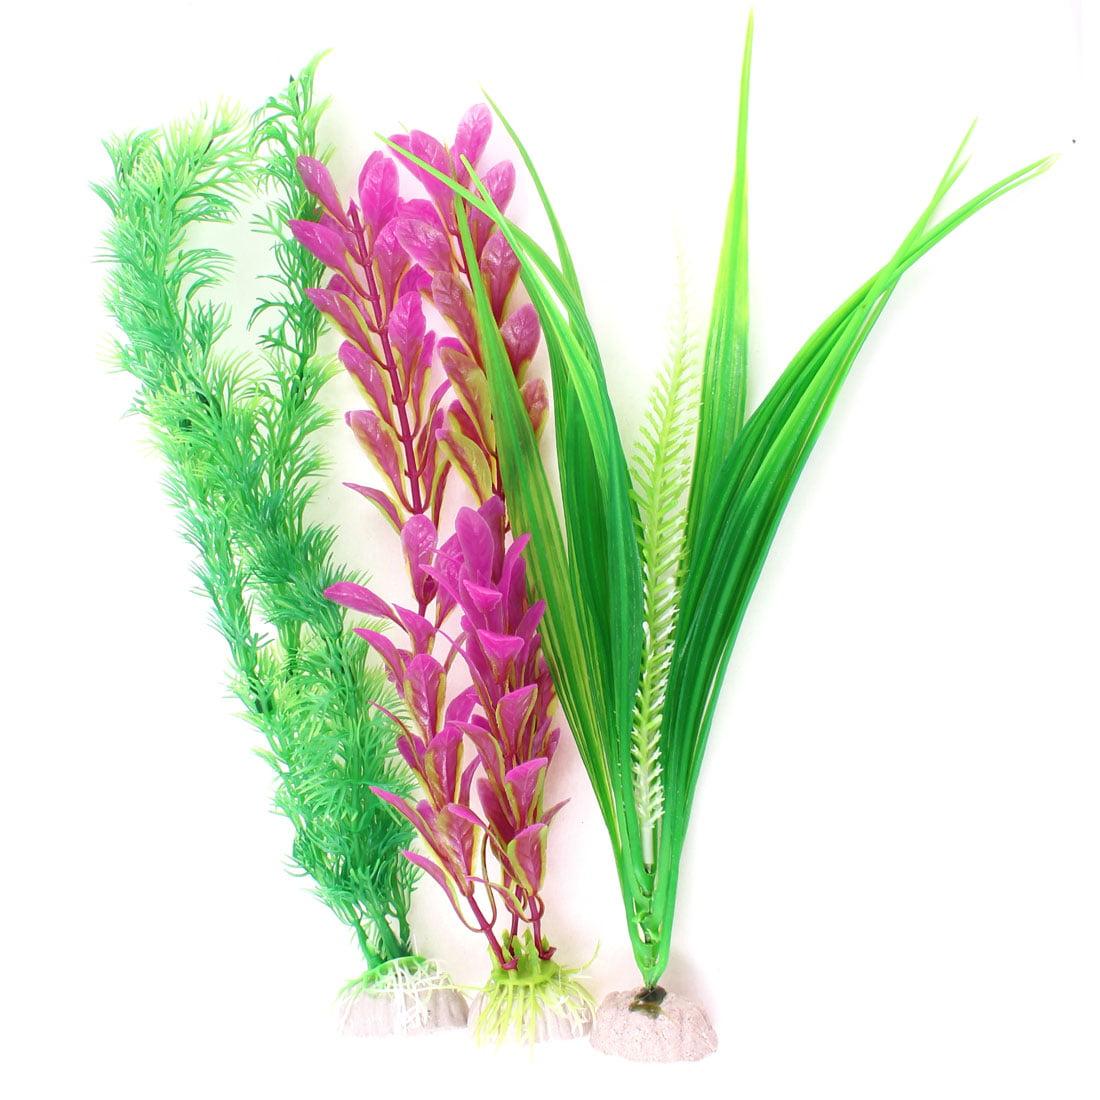 Unique Bargains Fuchsia Green Artificial Aquarium Decor Water Grass Plant 3PCS